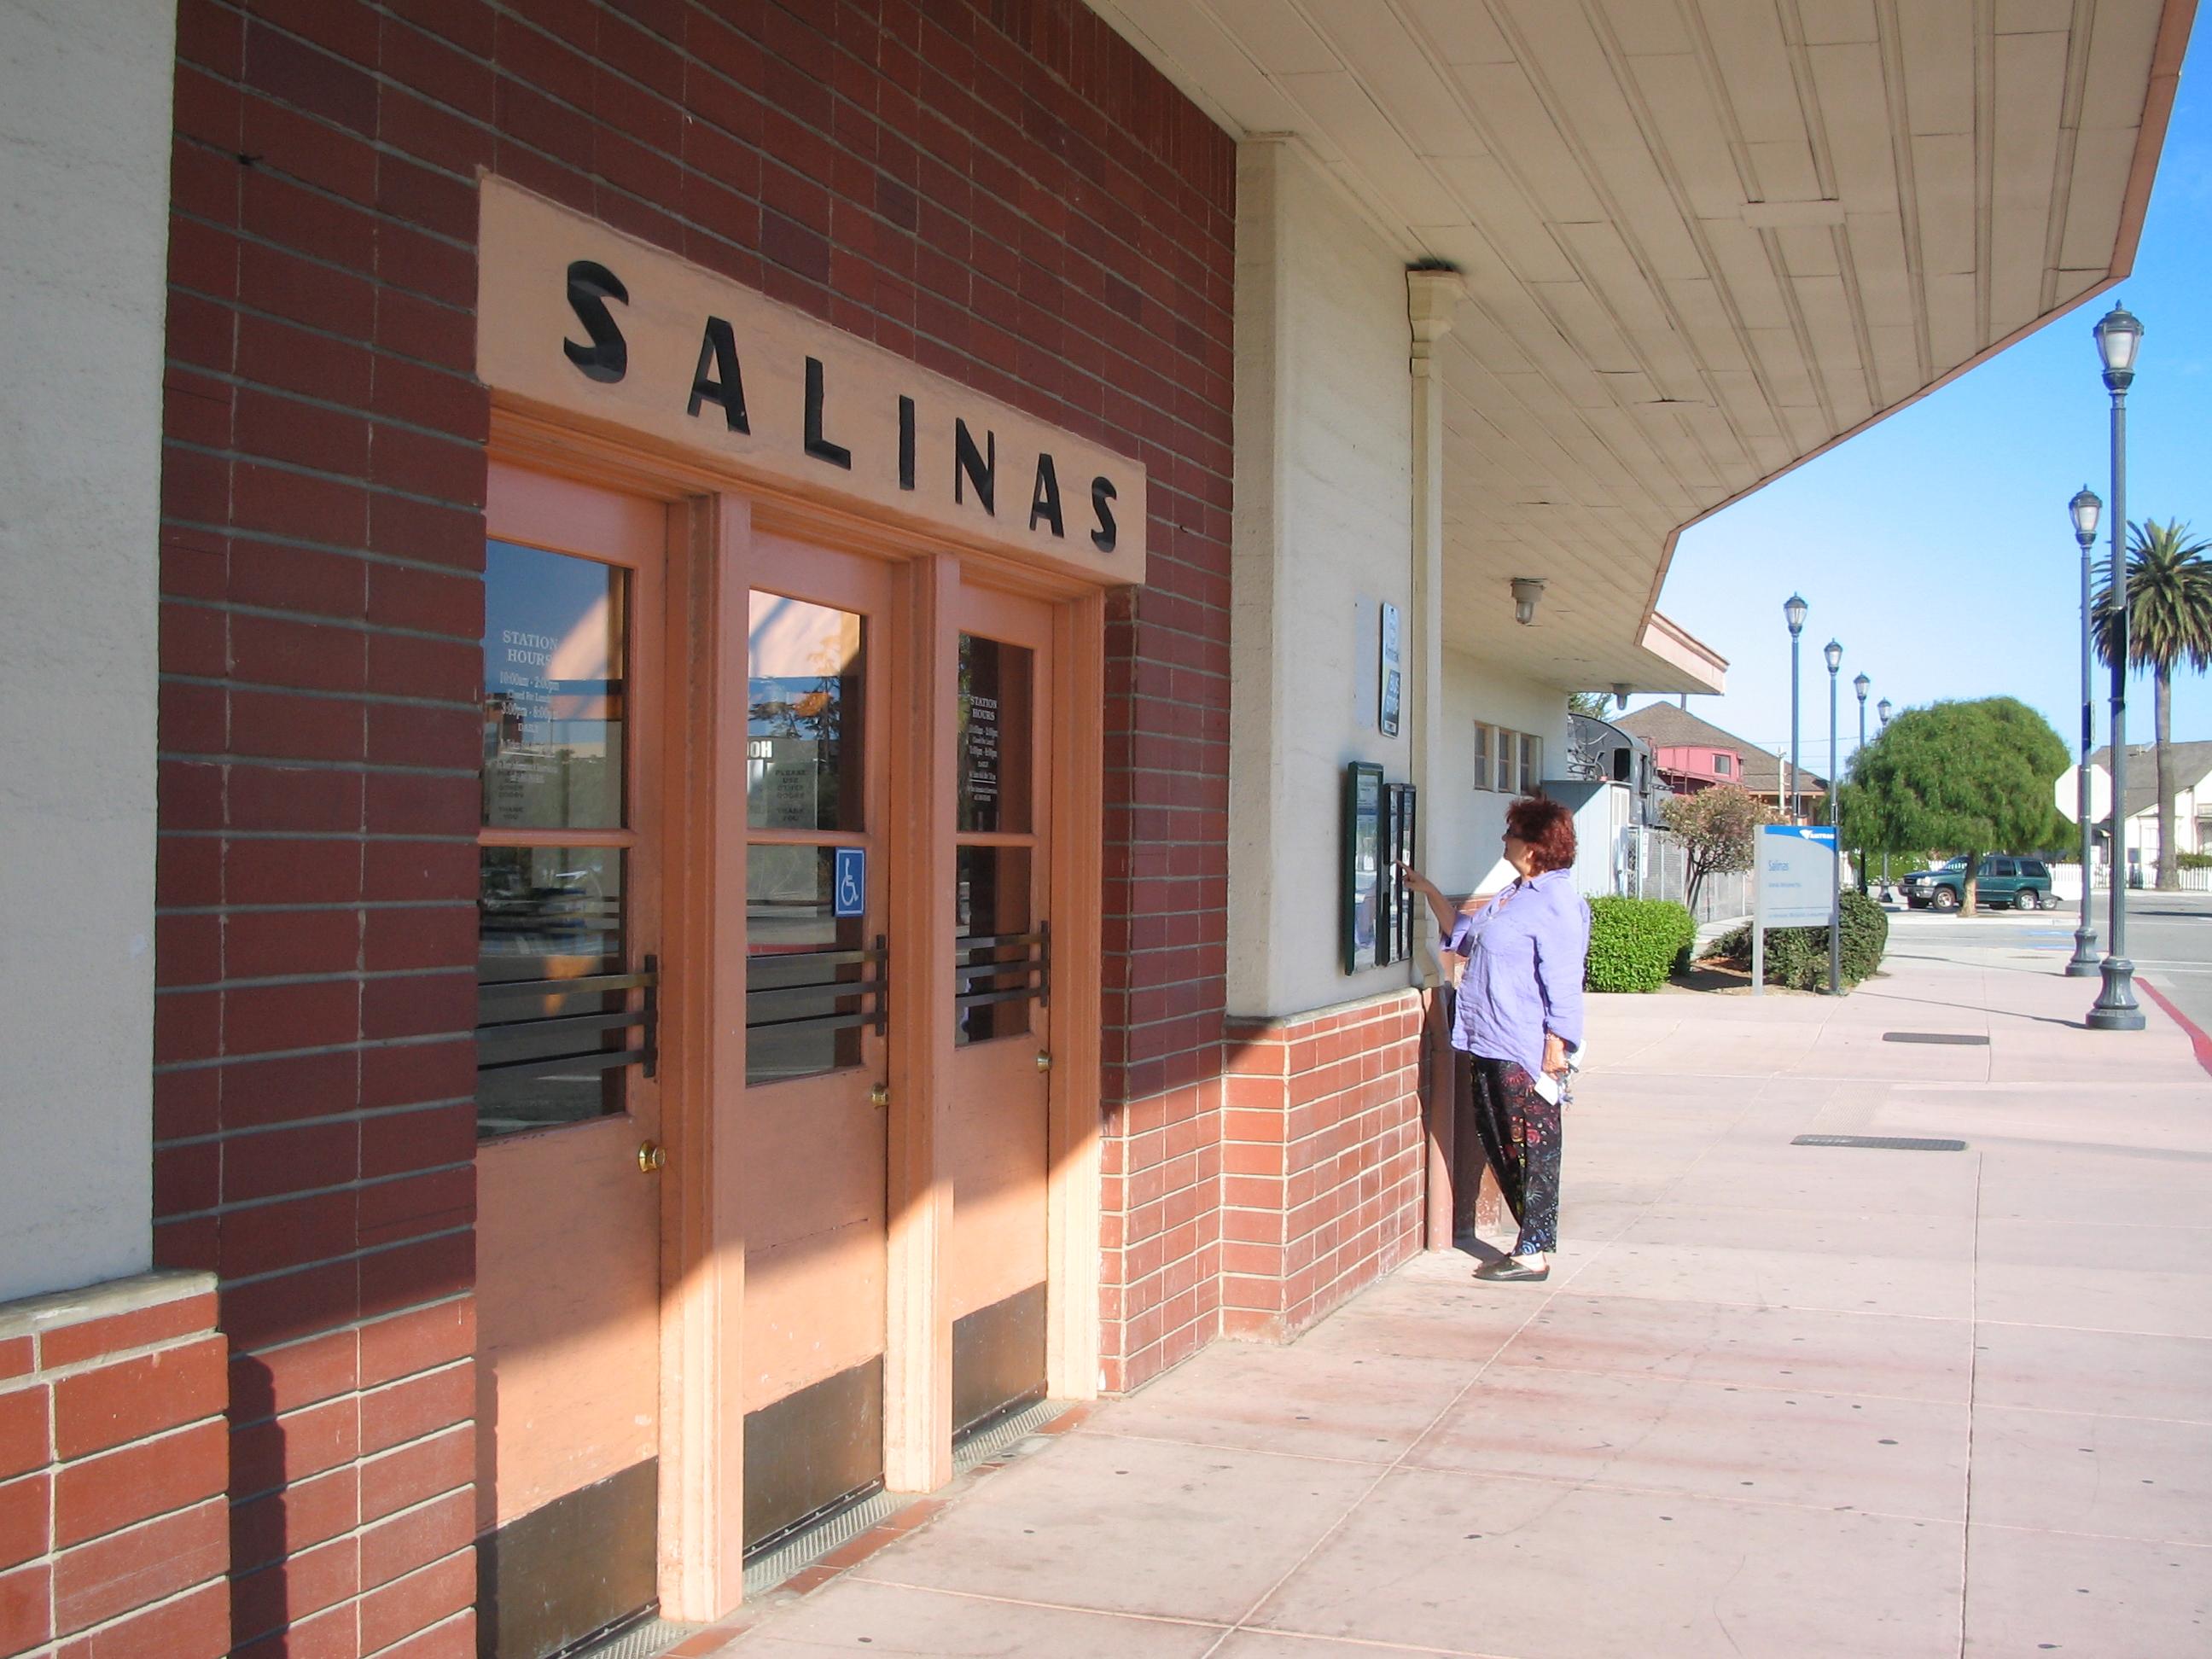 Salinas Dating Sites